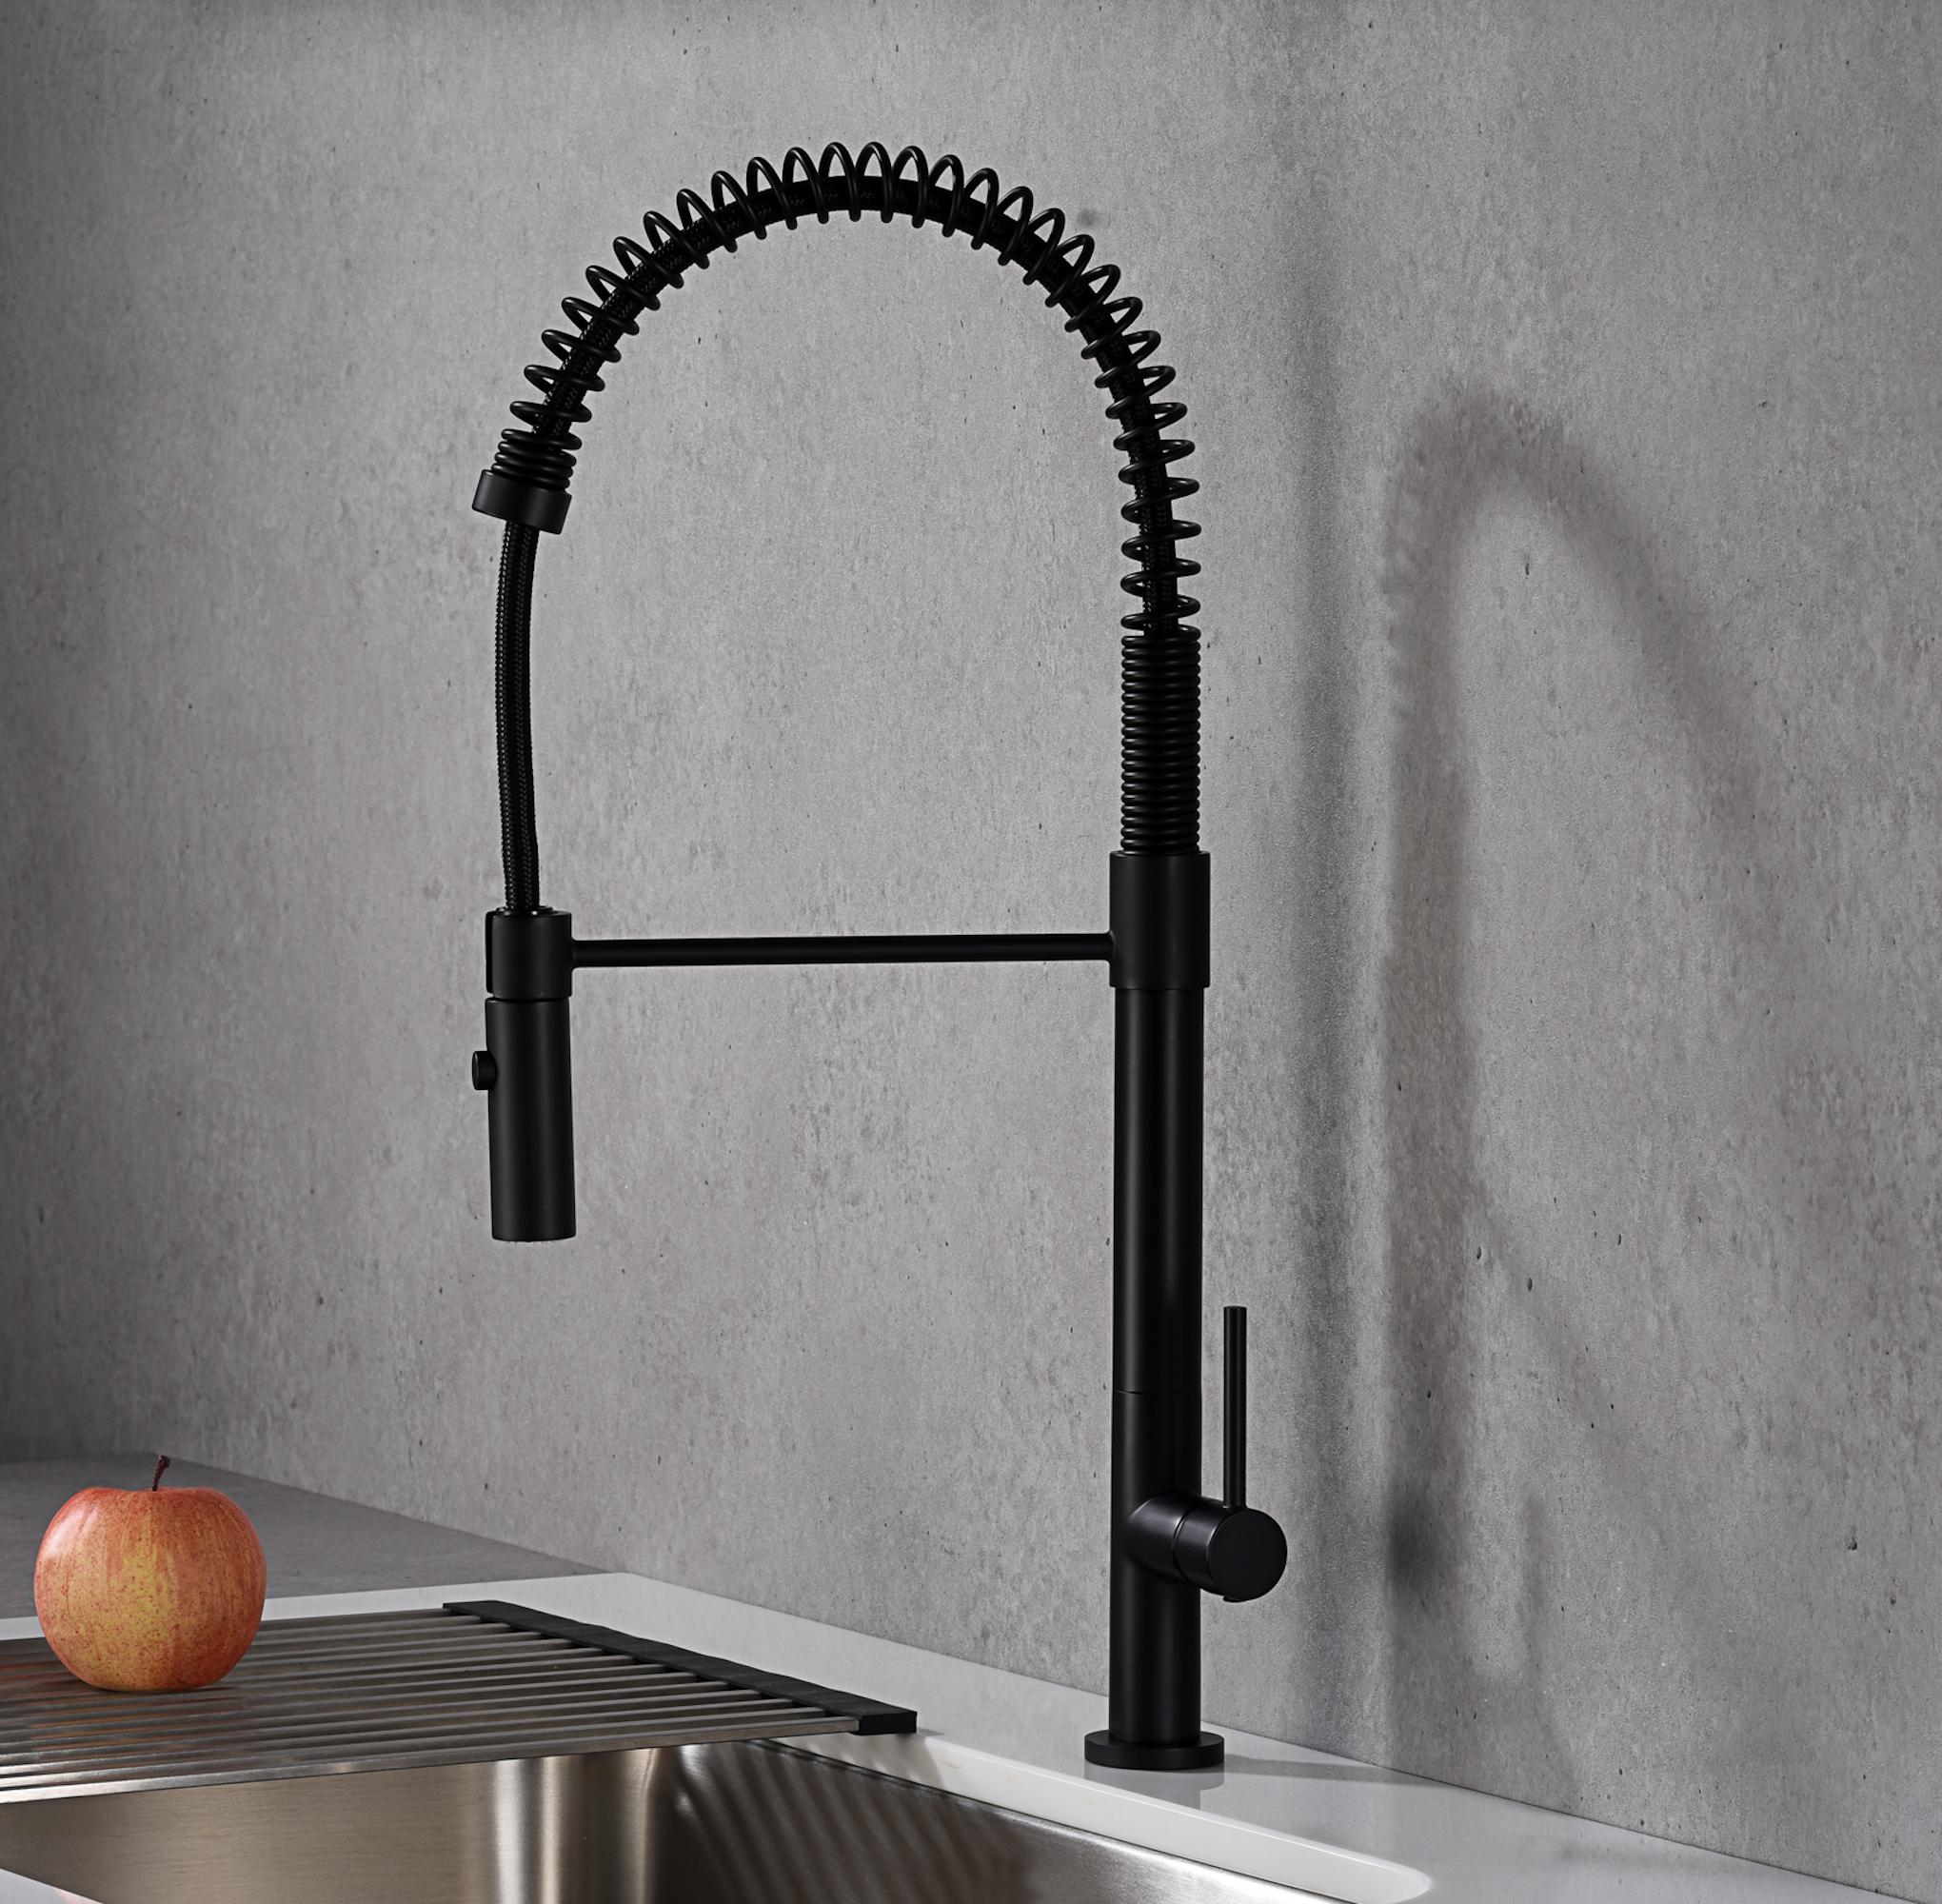 Karran Bluffton Single Lever Handle Lead-free Brass ADA Kitchen Faucet, Pull Down, Matte Black, KKF220MB